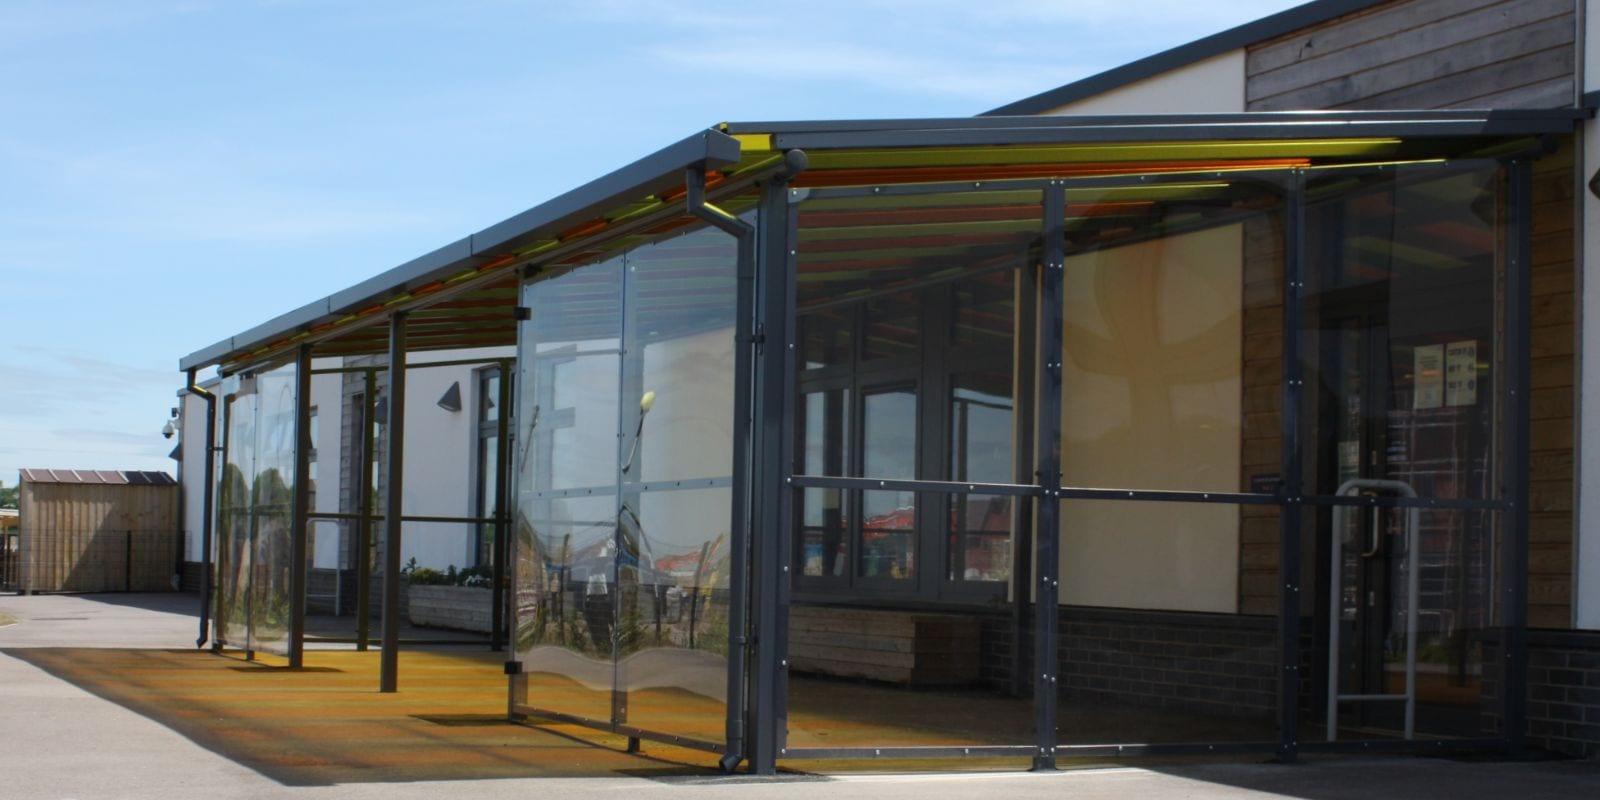 Colourful roof shelter we designed for Monksmoor Park Primary School